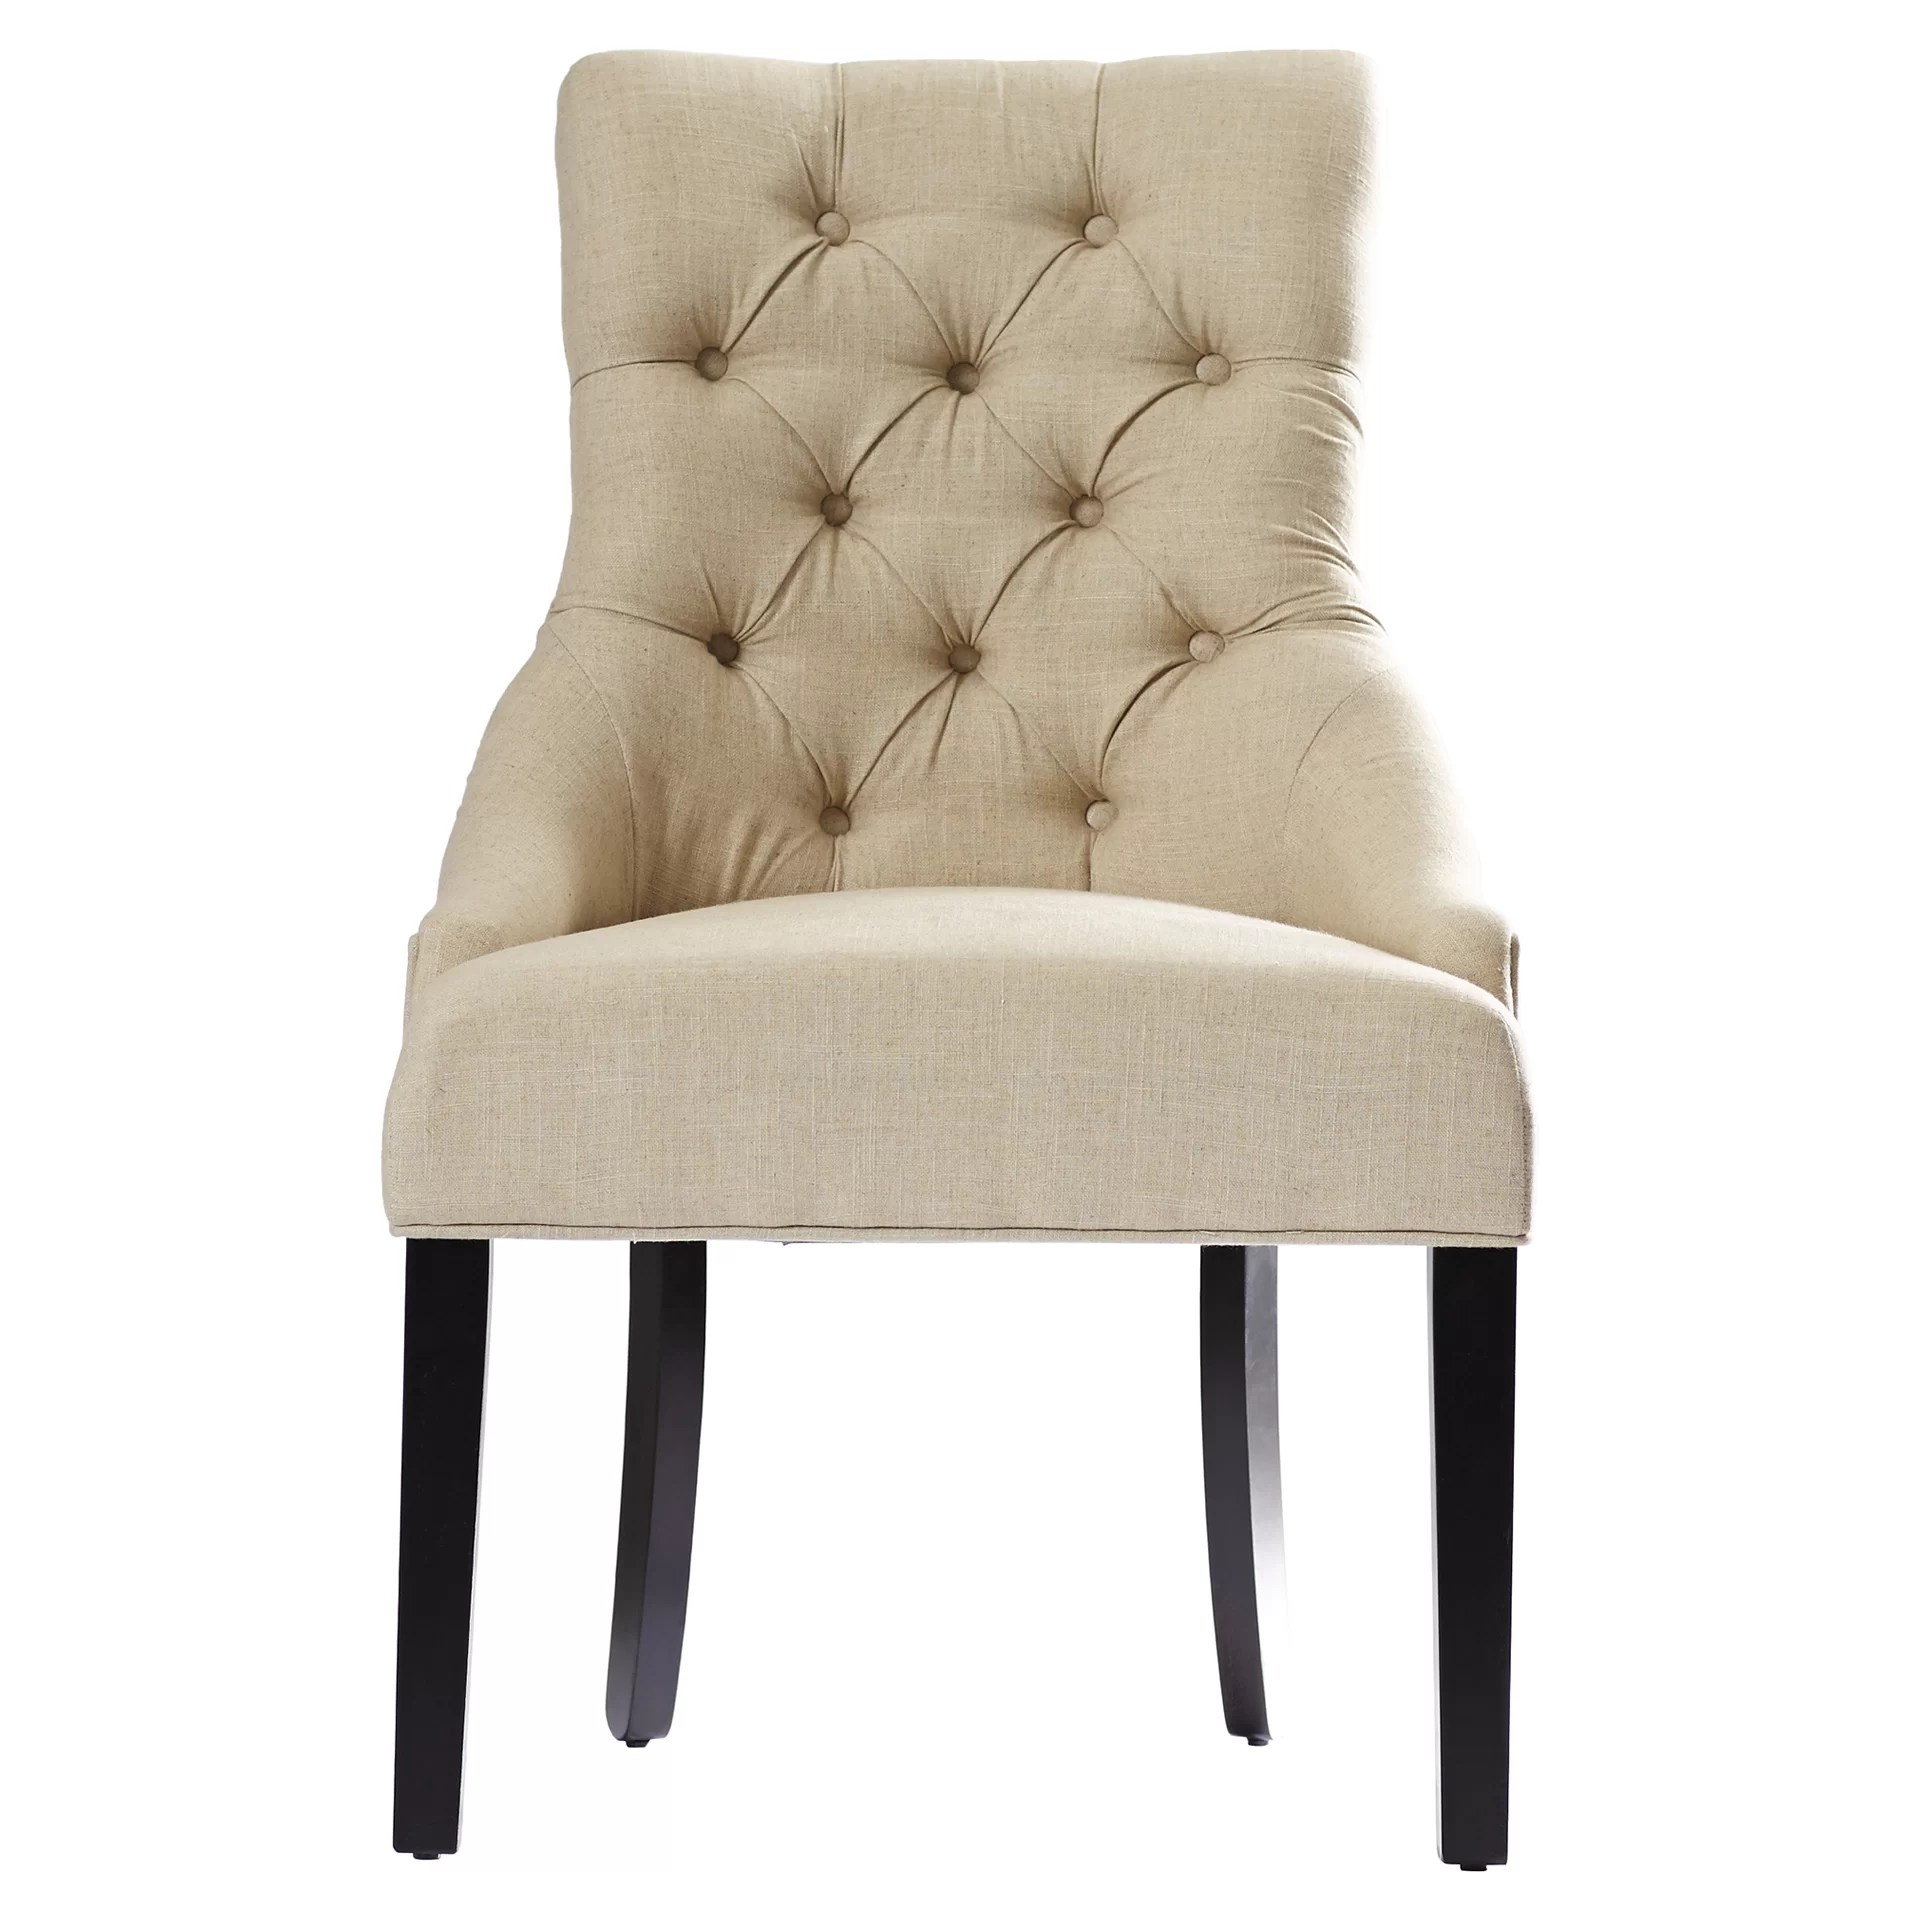 House of Hampton Jodie Tufted Nailhead Parsons Chair